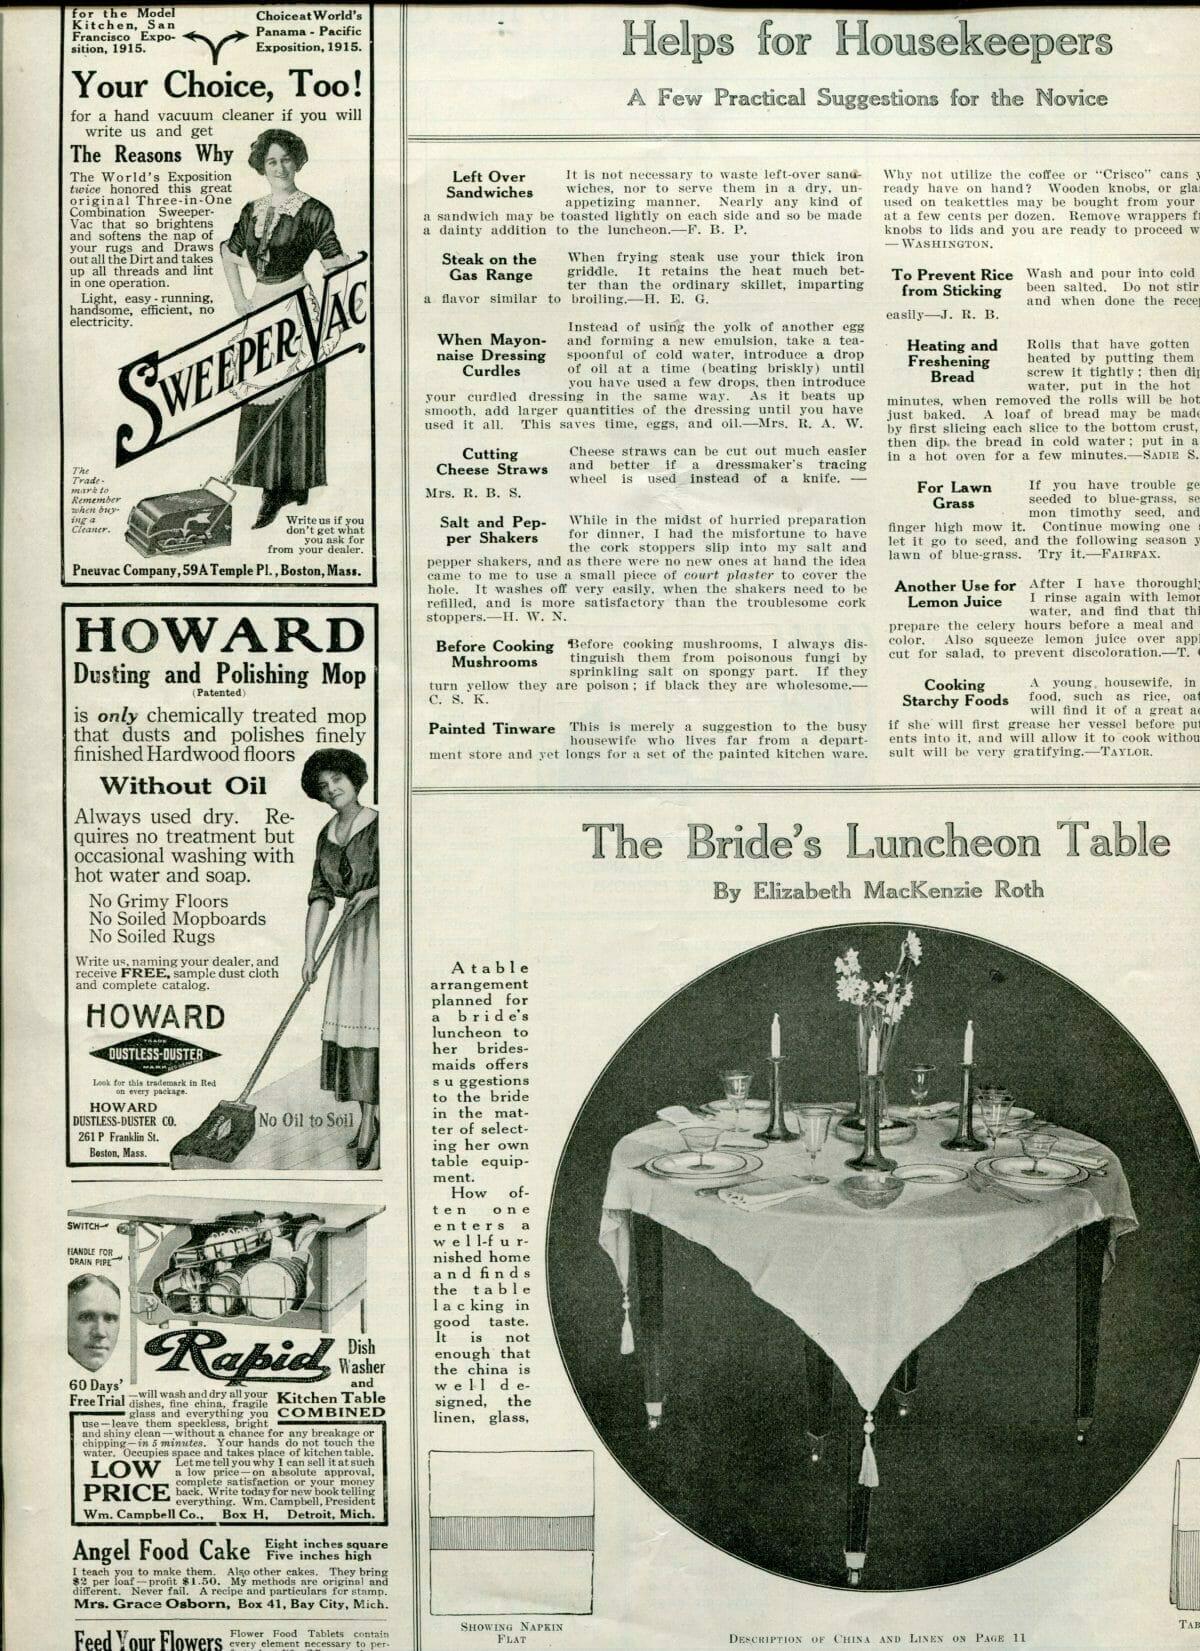 edwardian bridal luncheon table